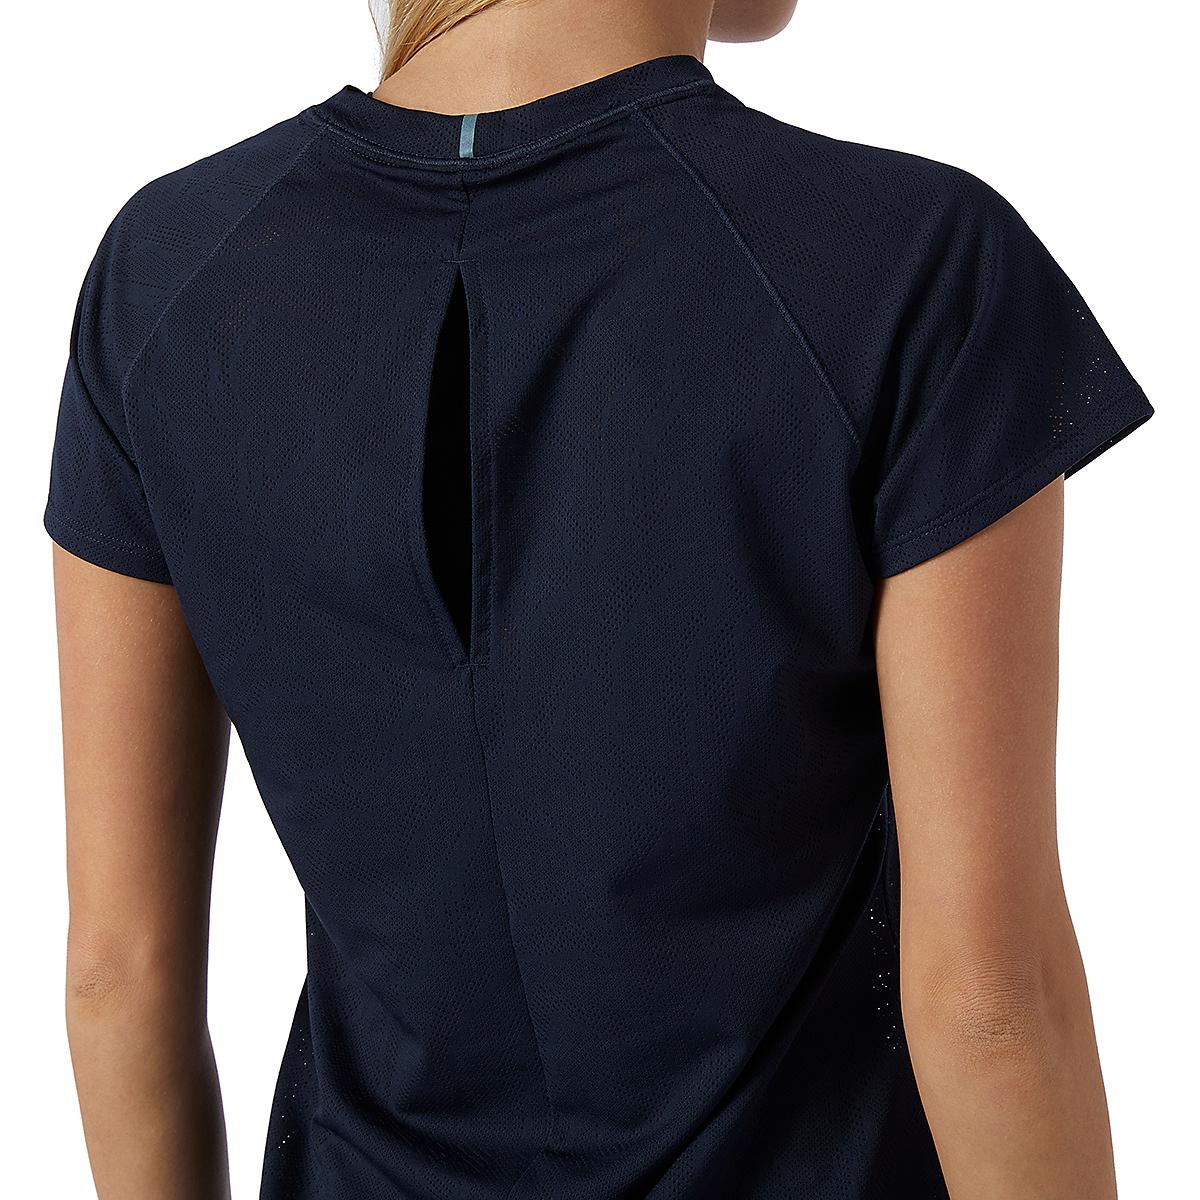 Women's New Balance Q Speed Fuel Jacquard Short Sleeve - Color: Eclipse - Size: XS, Eclipse, large, image 4